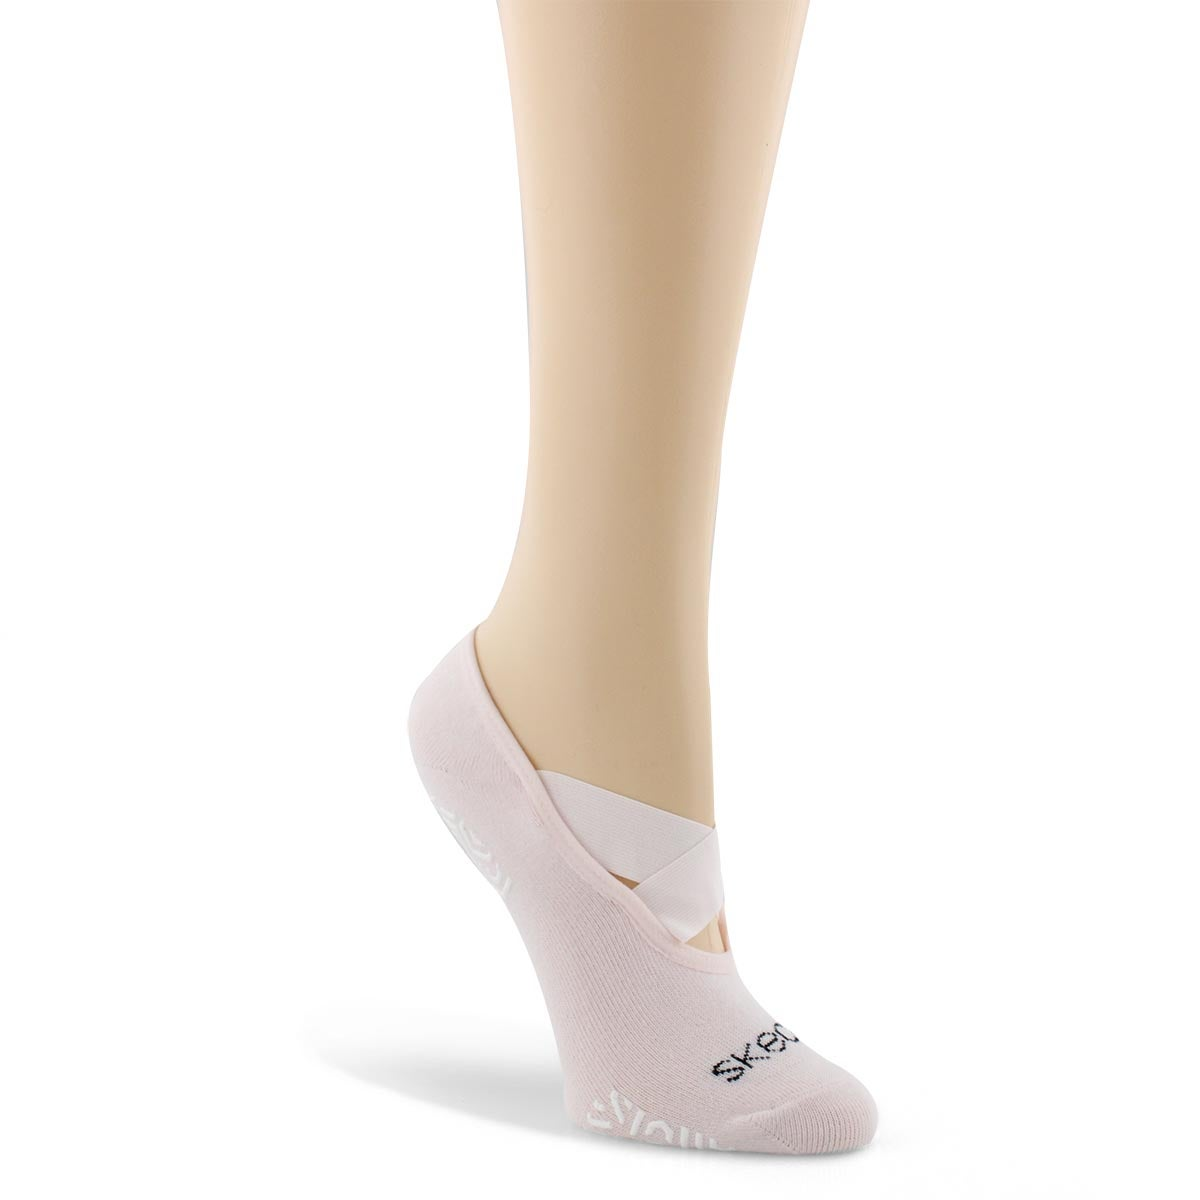 Women's NON TERRY STUDIO LINER mauve socks